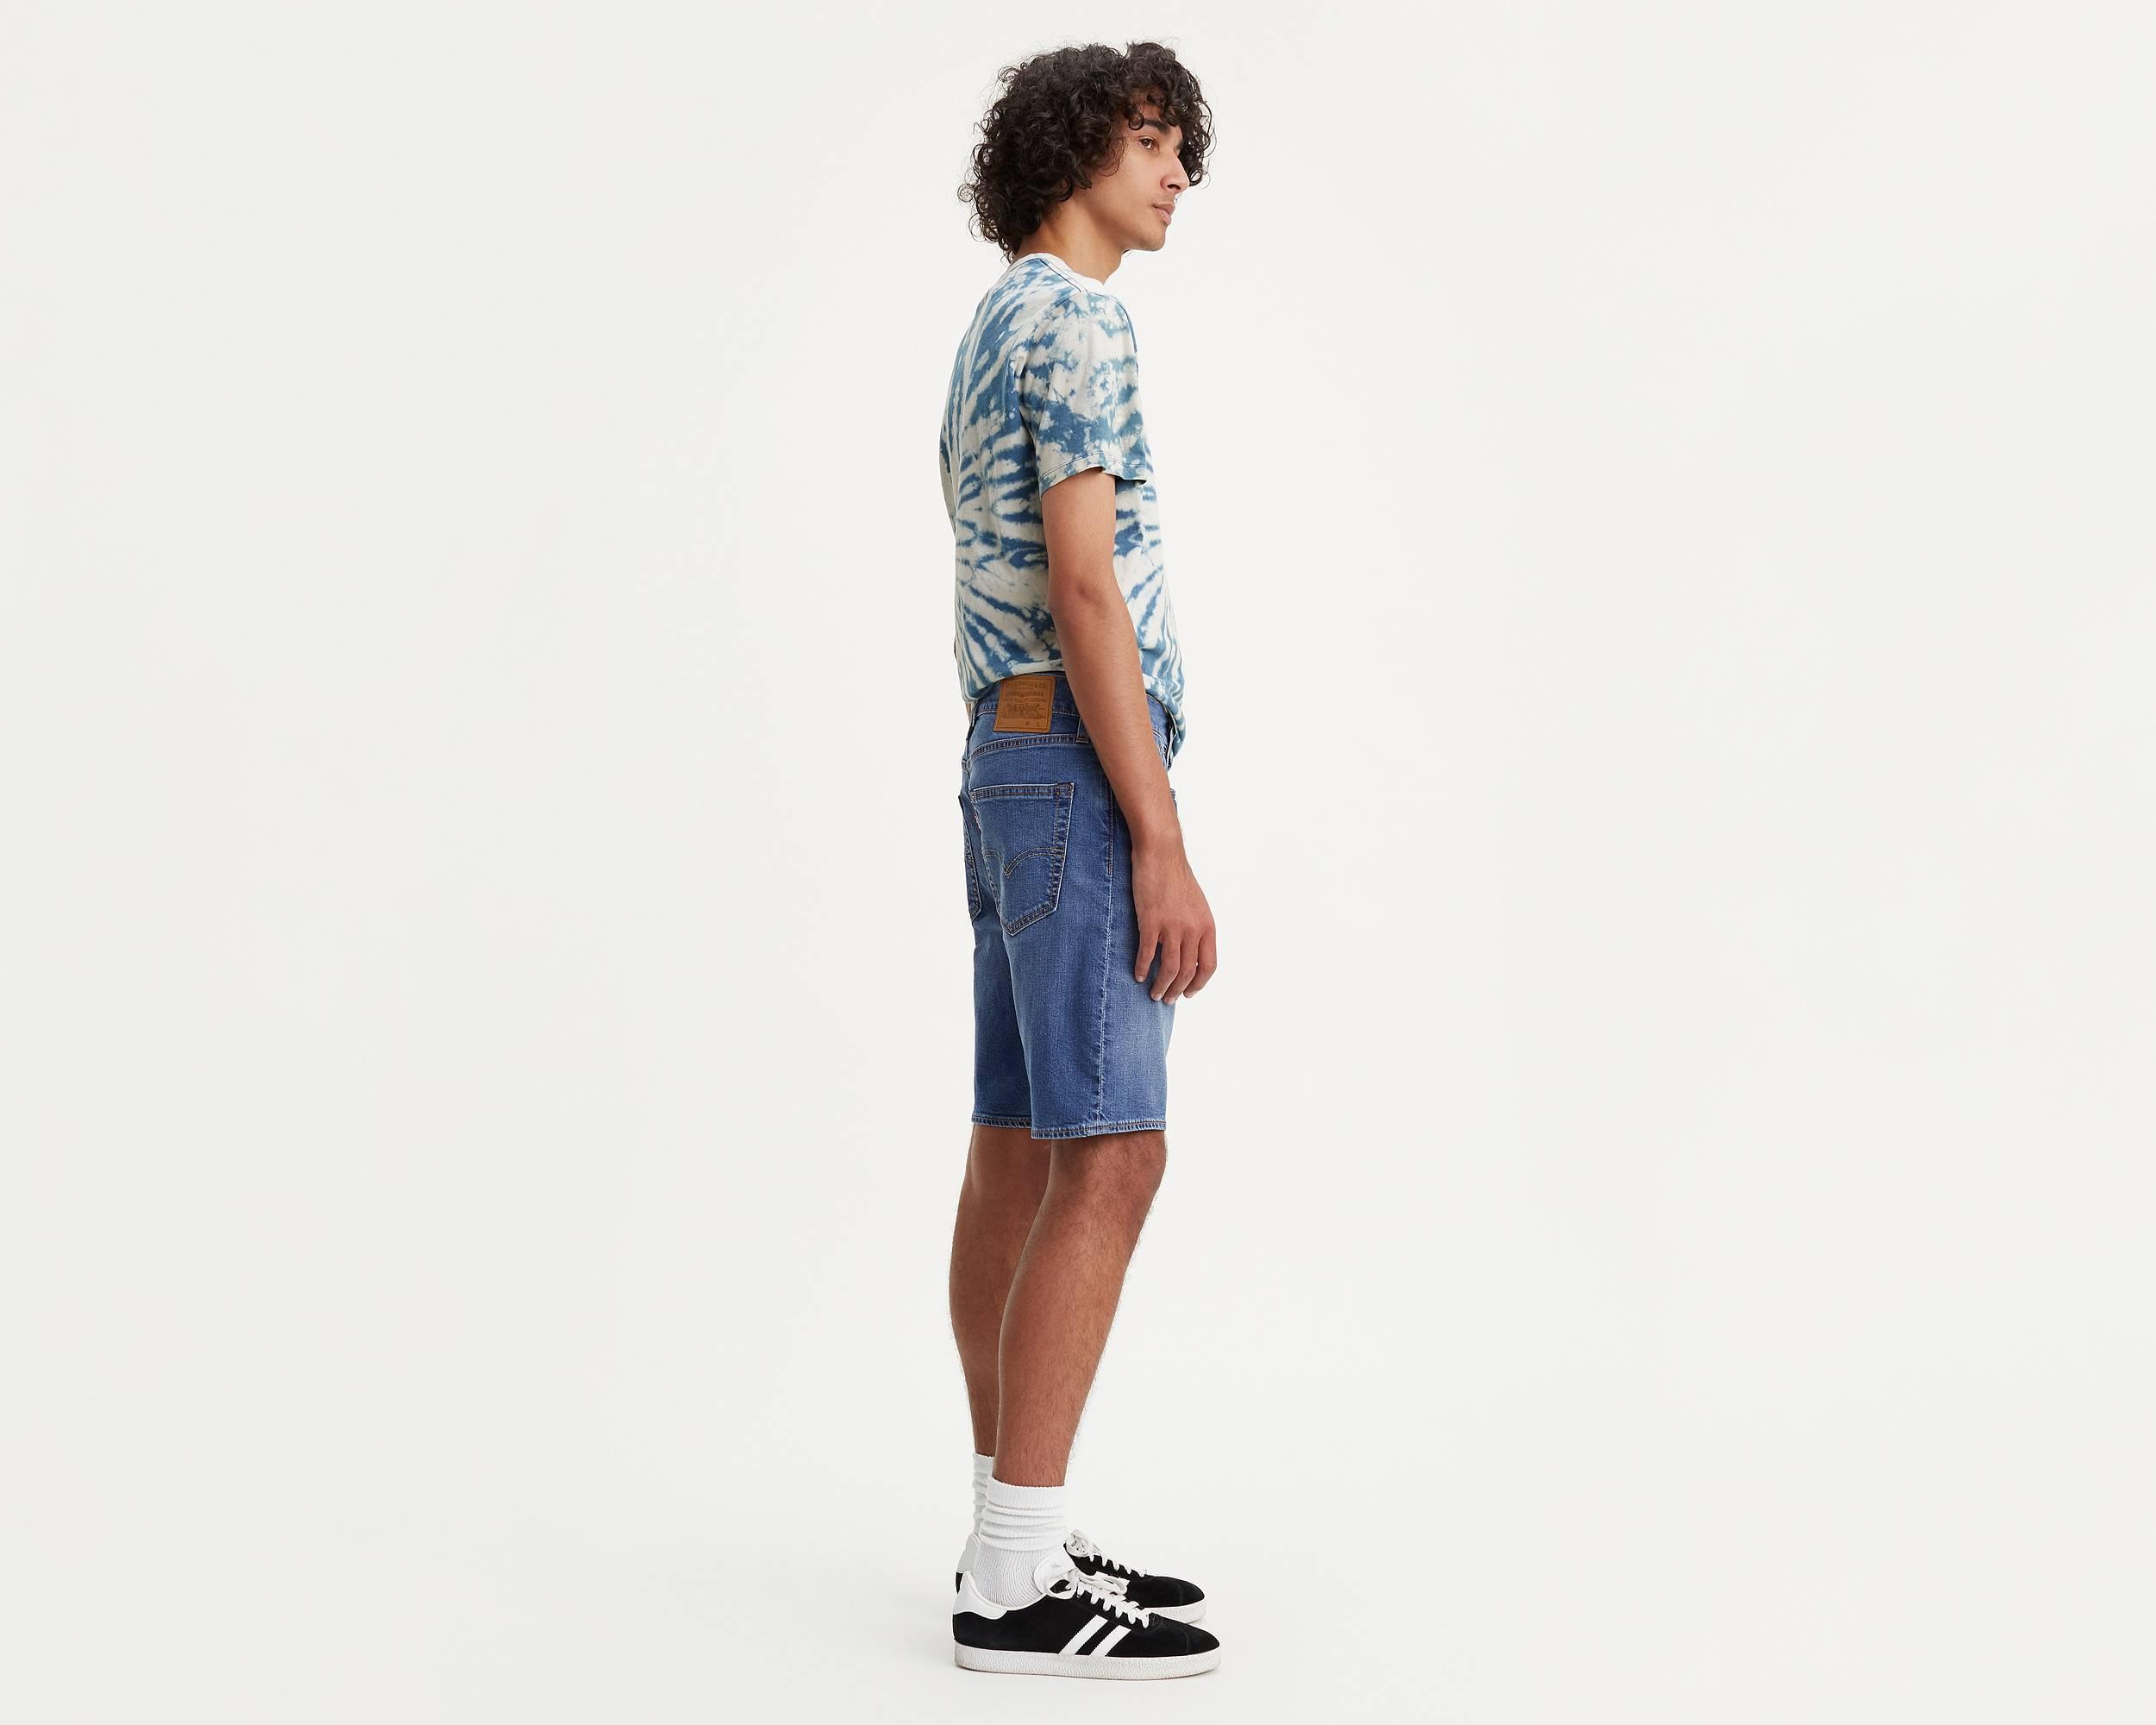 684303745d4 502™ Taper Hemmed Shorts - Levi's Jeans, Jackets & Clothing